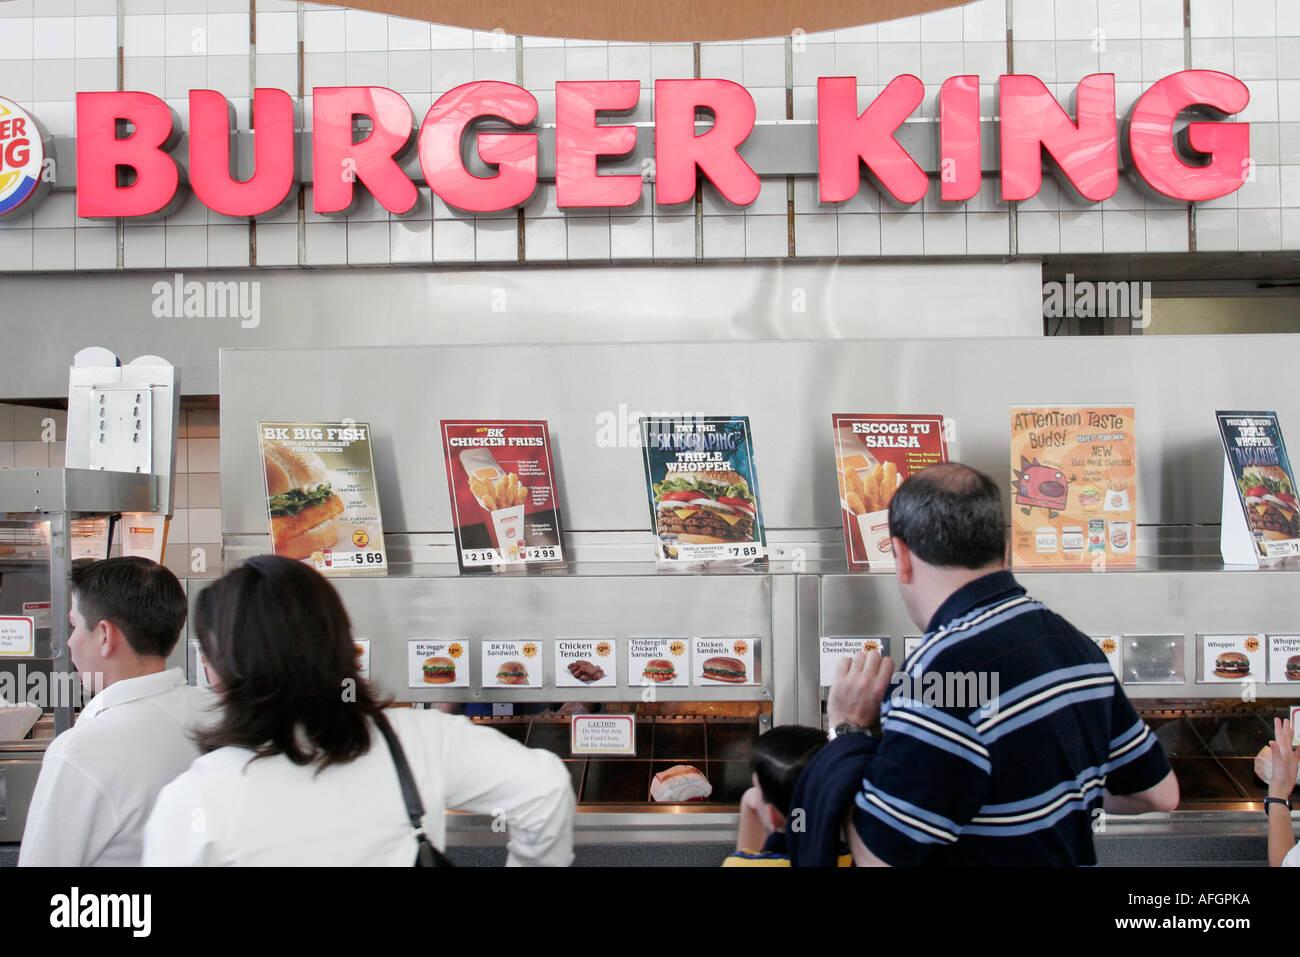 Orlando Florida Airport Burger King Fast Food Restaurant